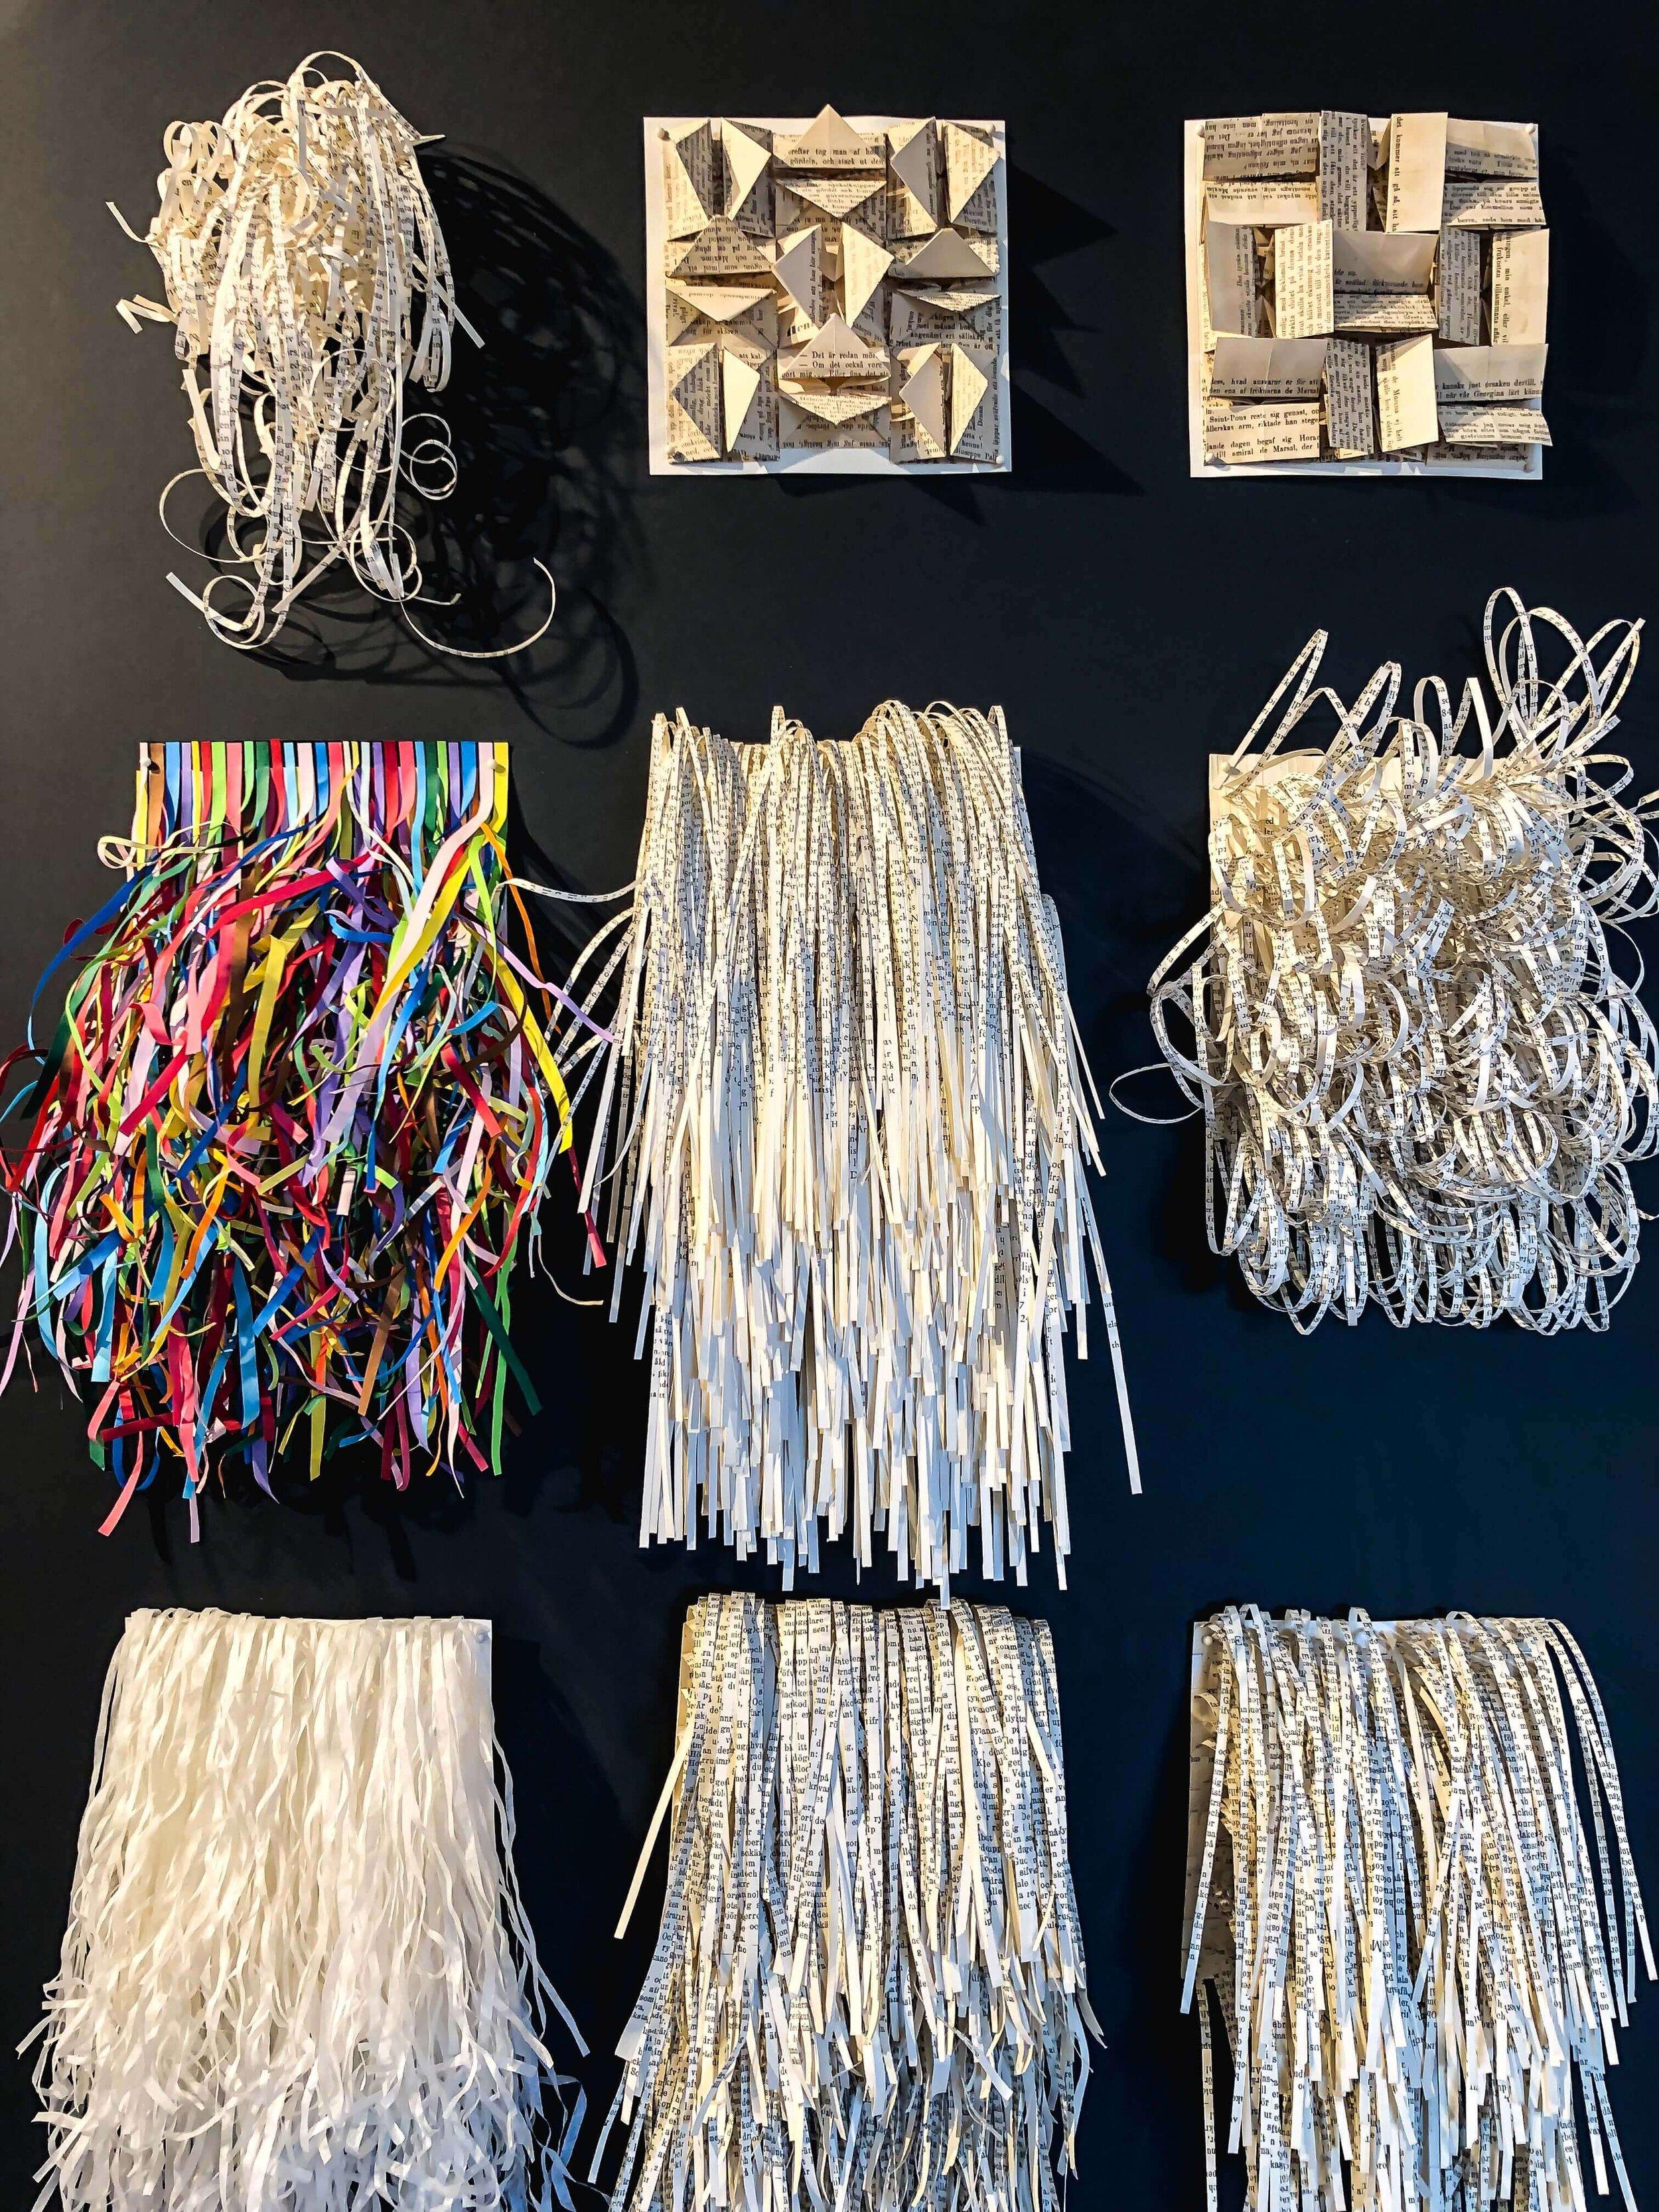 Linda-Allard-Forsman--Tomas-Robefelt--papper--sadelmakarlangan--2019--4.JPEG